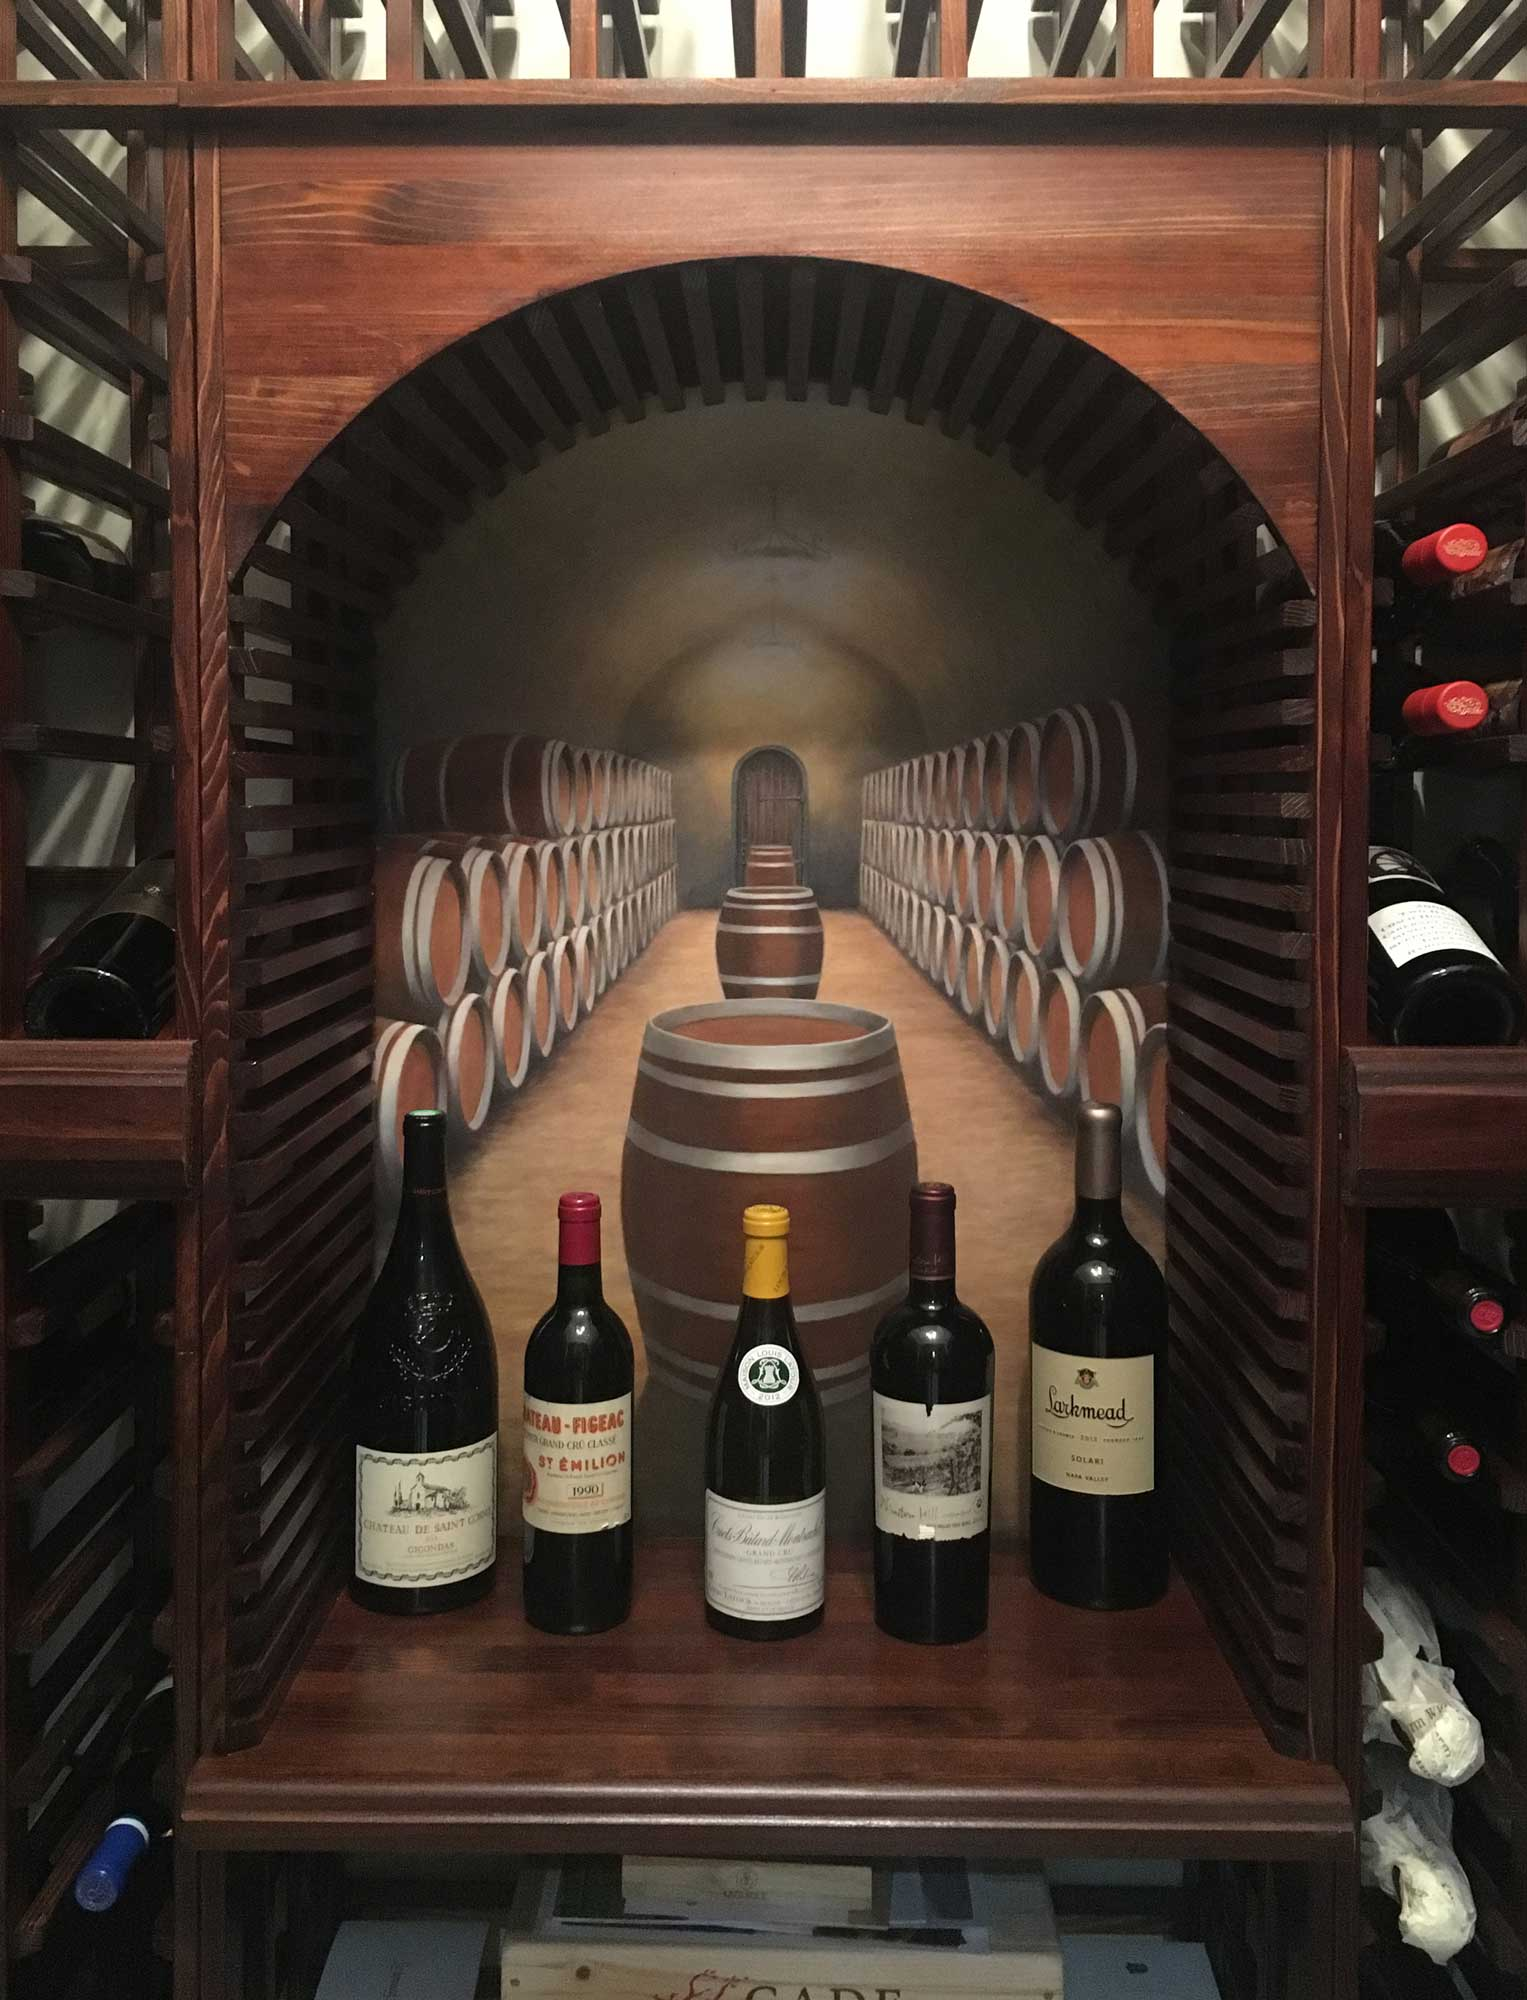 Oak wine barrels stock photo. Image of columns, vintner ...   Barrel Wine Cellar